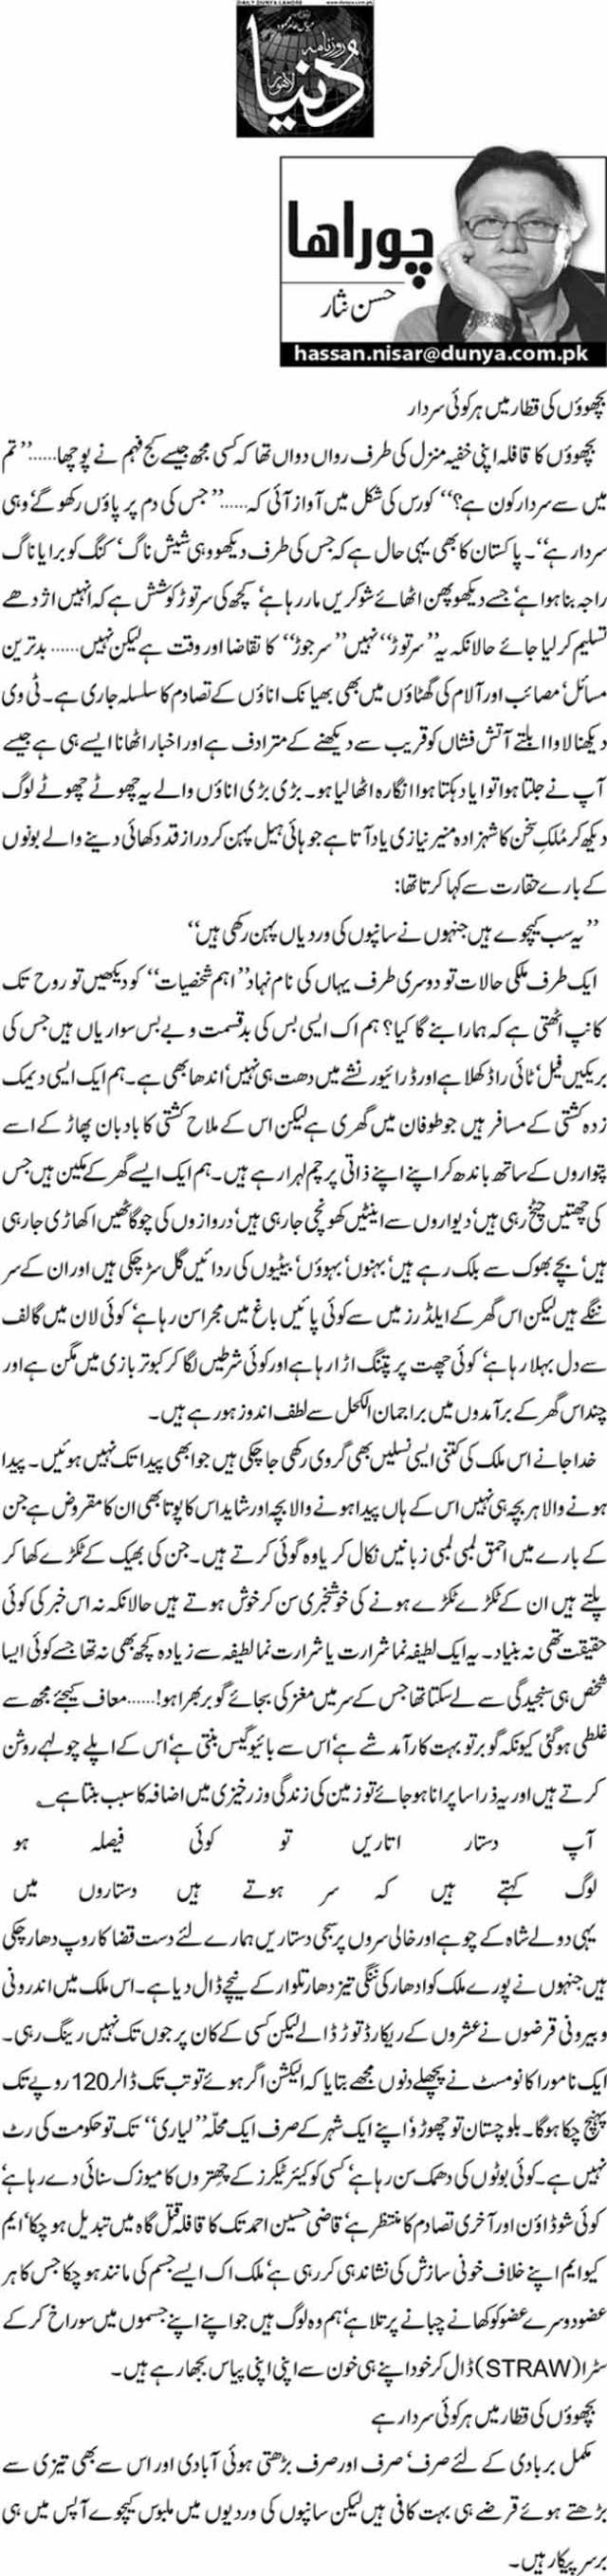 Bichowon ki qataar main har koi sardar - Hassan Nisar